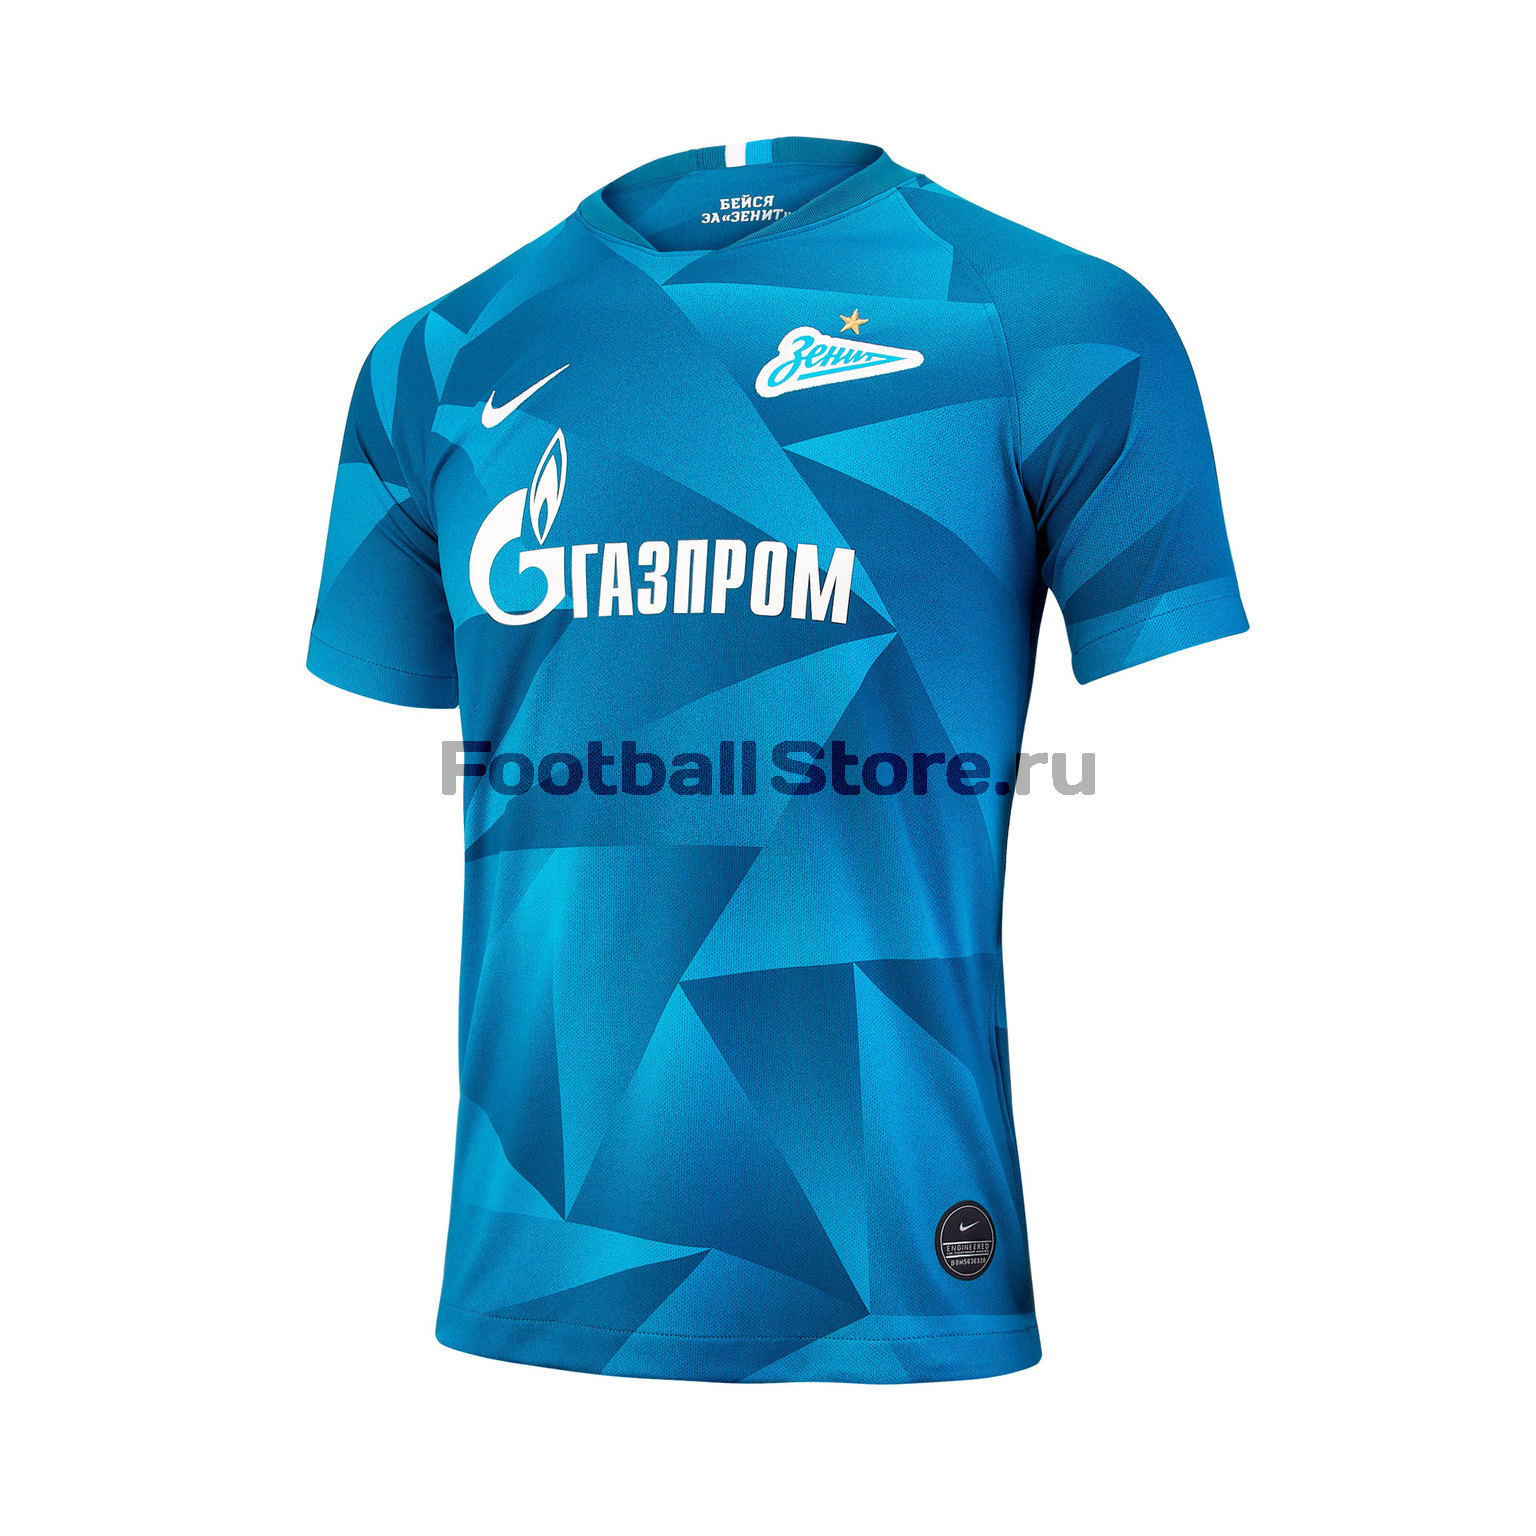 Фото - Подростковая домашняя футболка Nike ФК Зенит 2019/20 выездная игровая футболка nike фк зенит 2019 20